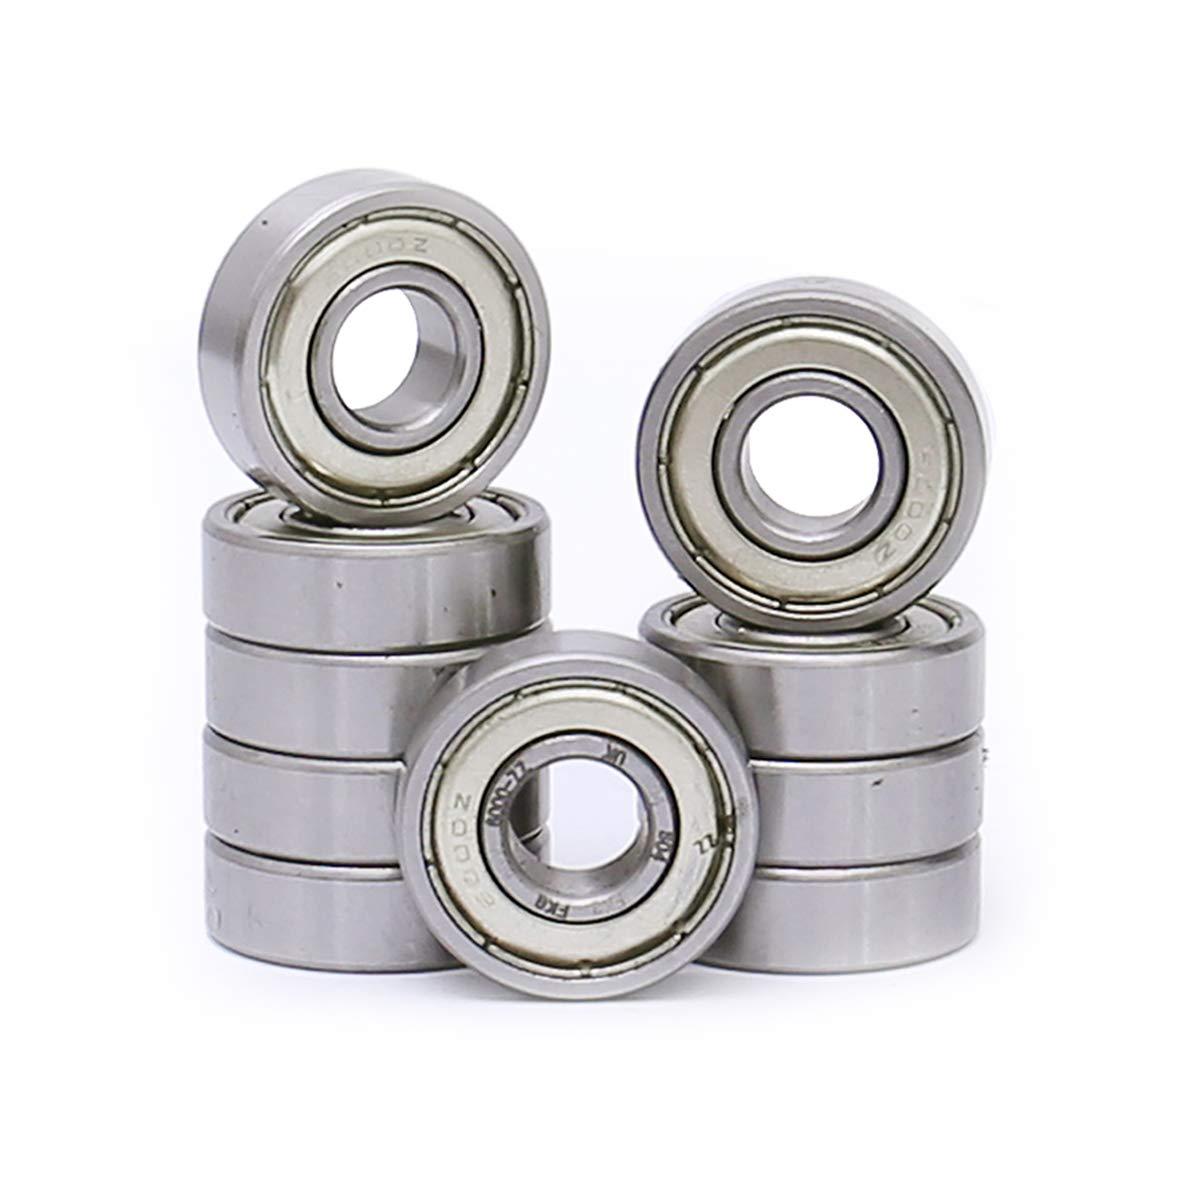 FKG 6000-ZZ 10x26x8mm Deep Groove Ball Bearing Double Metal Shields Bearing Pre-Lubricated 10 Pcs